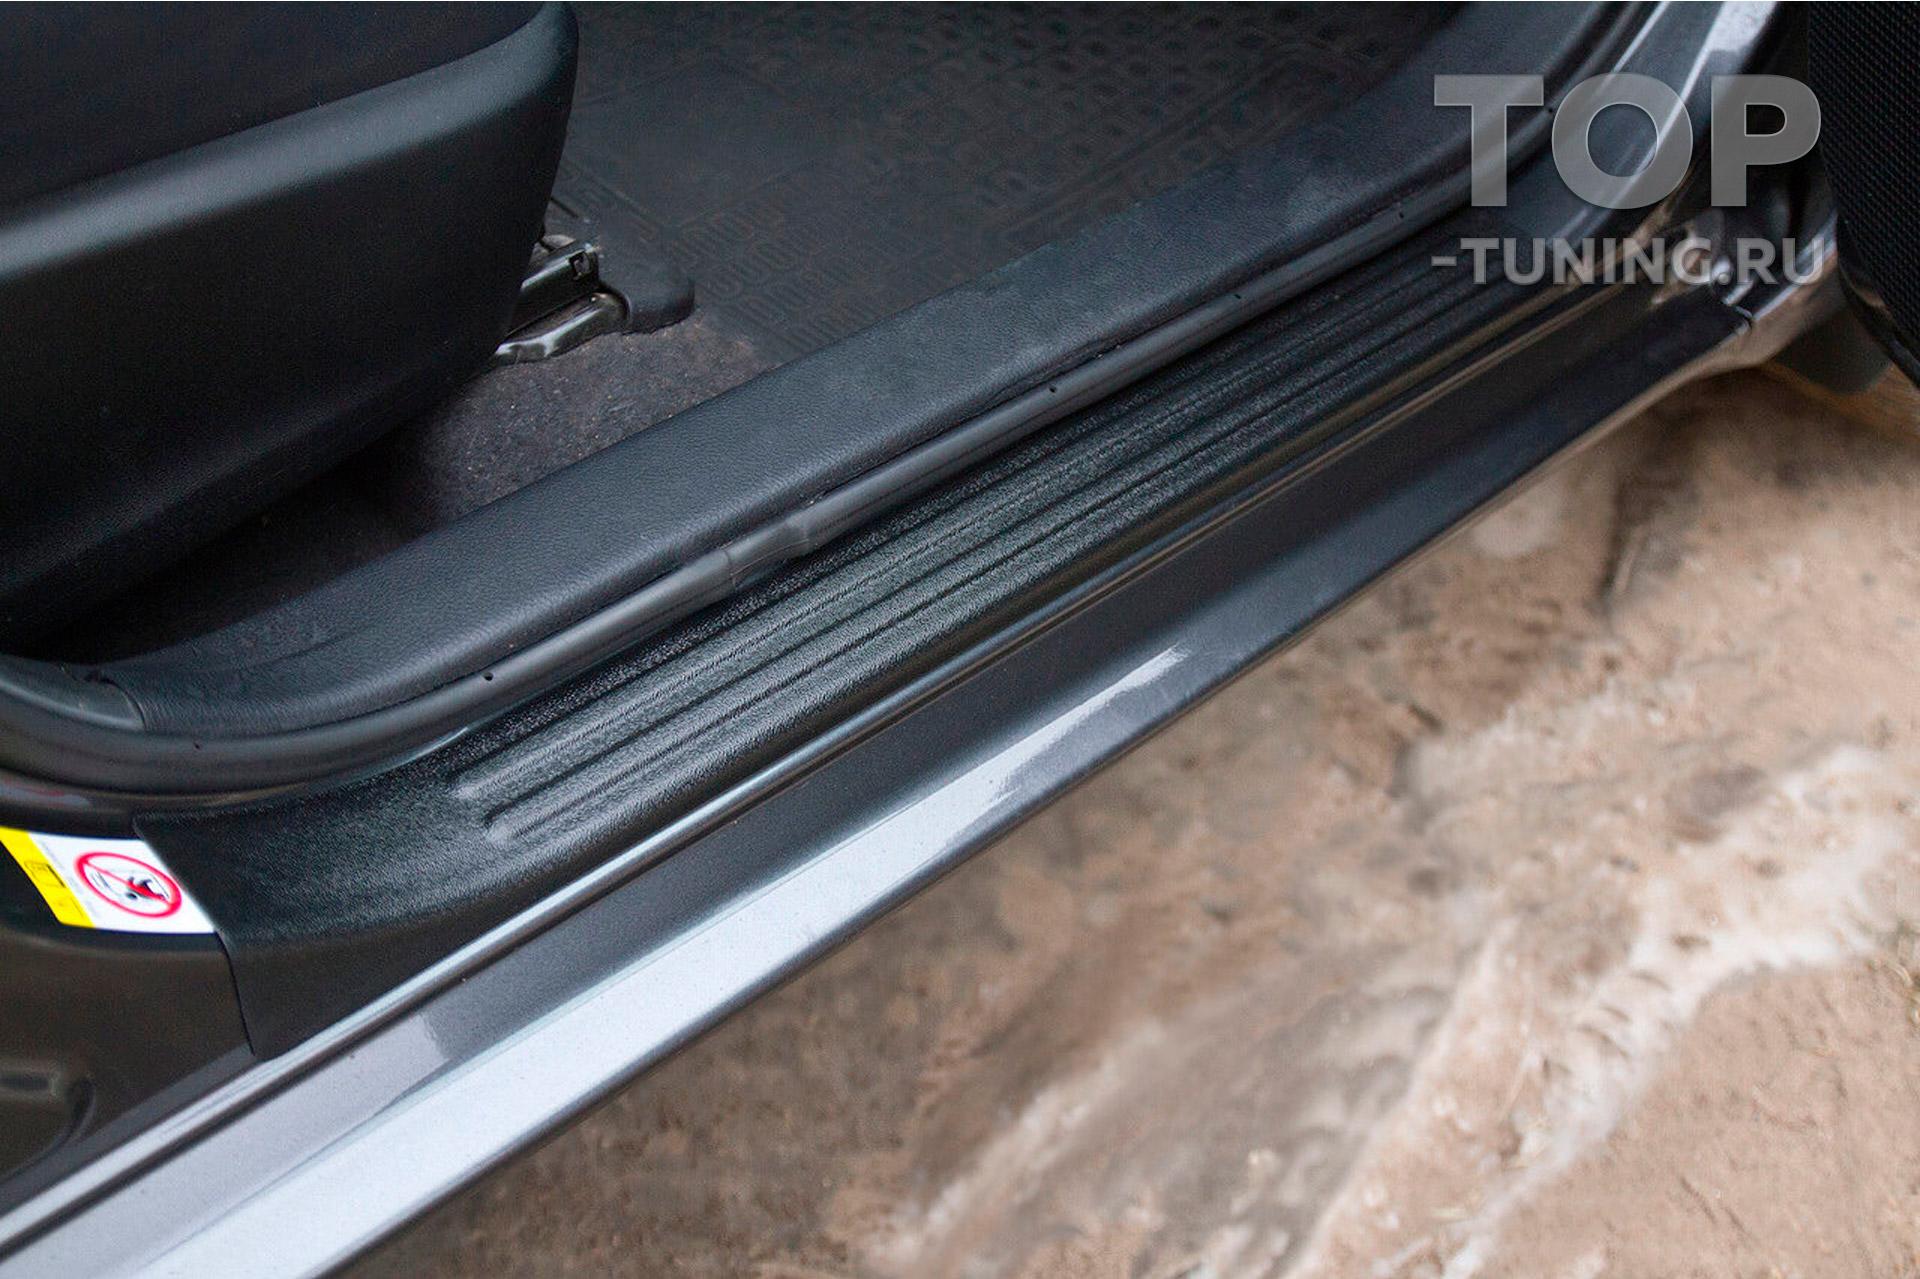 Накладки на внутренние пороги дверей Toyota Corolla (седан) 2012-2015 кузов 160